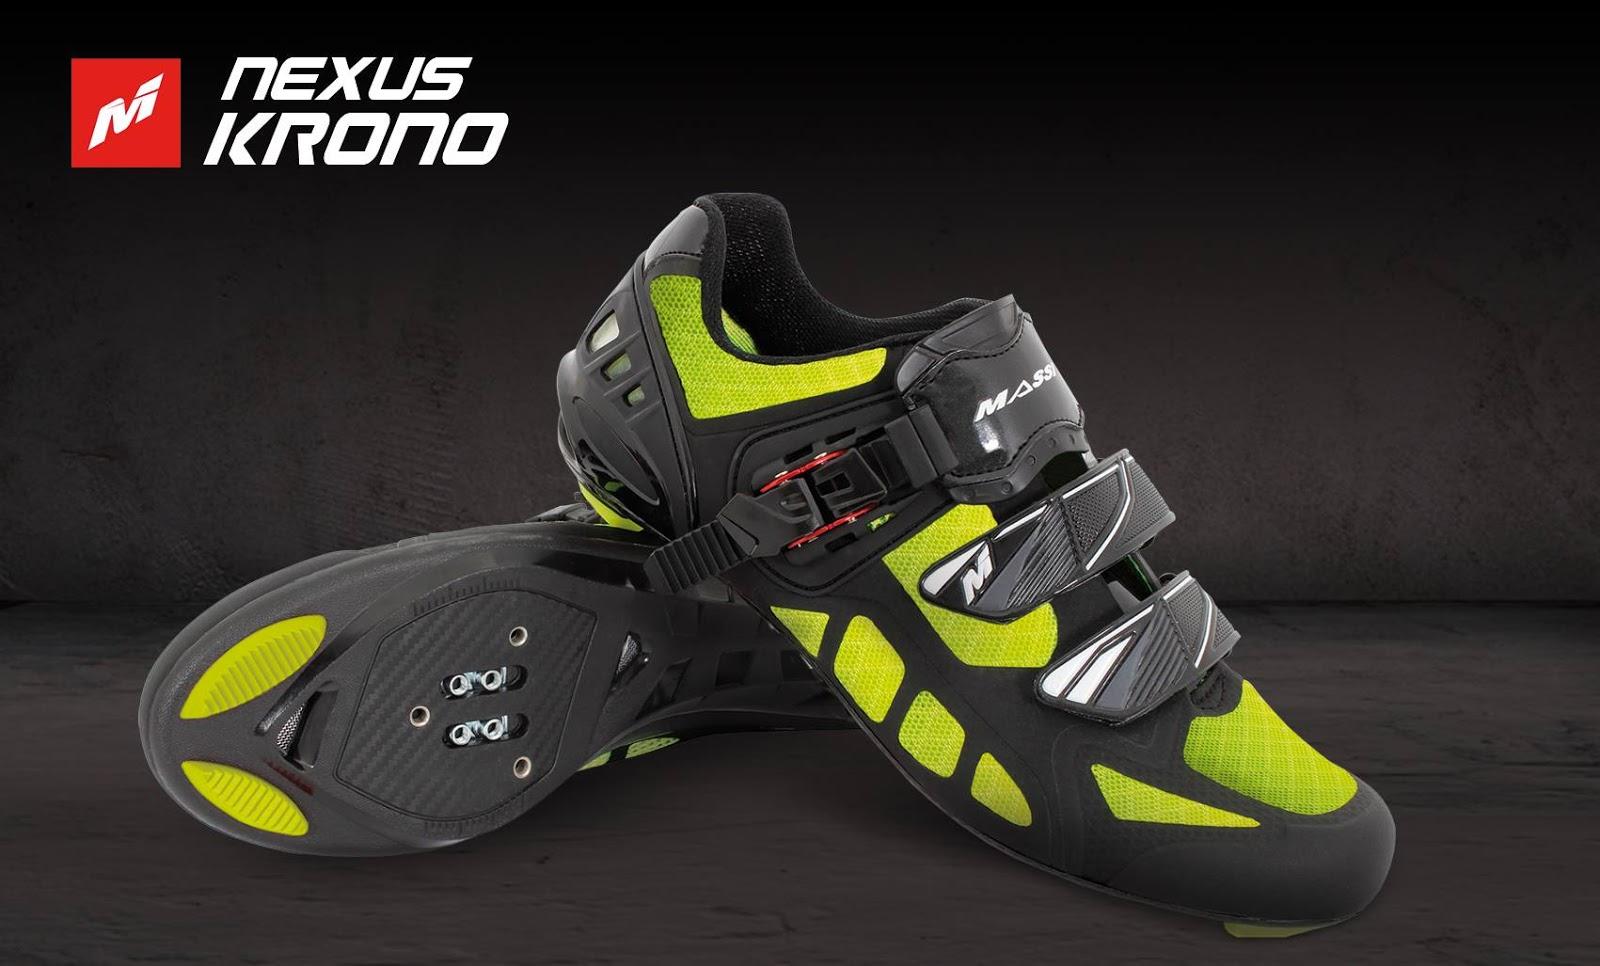 729c8ac6e6414 Nuevas zapatillas para carretera Massi Nexus Krono ~ Ultimate Bikes ...